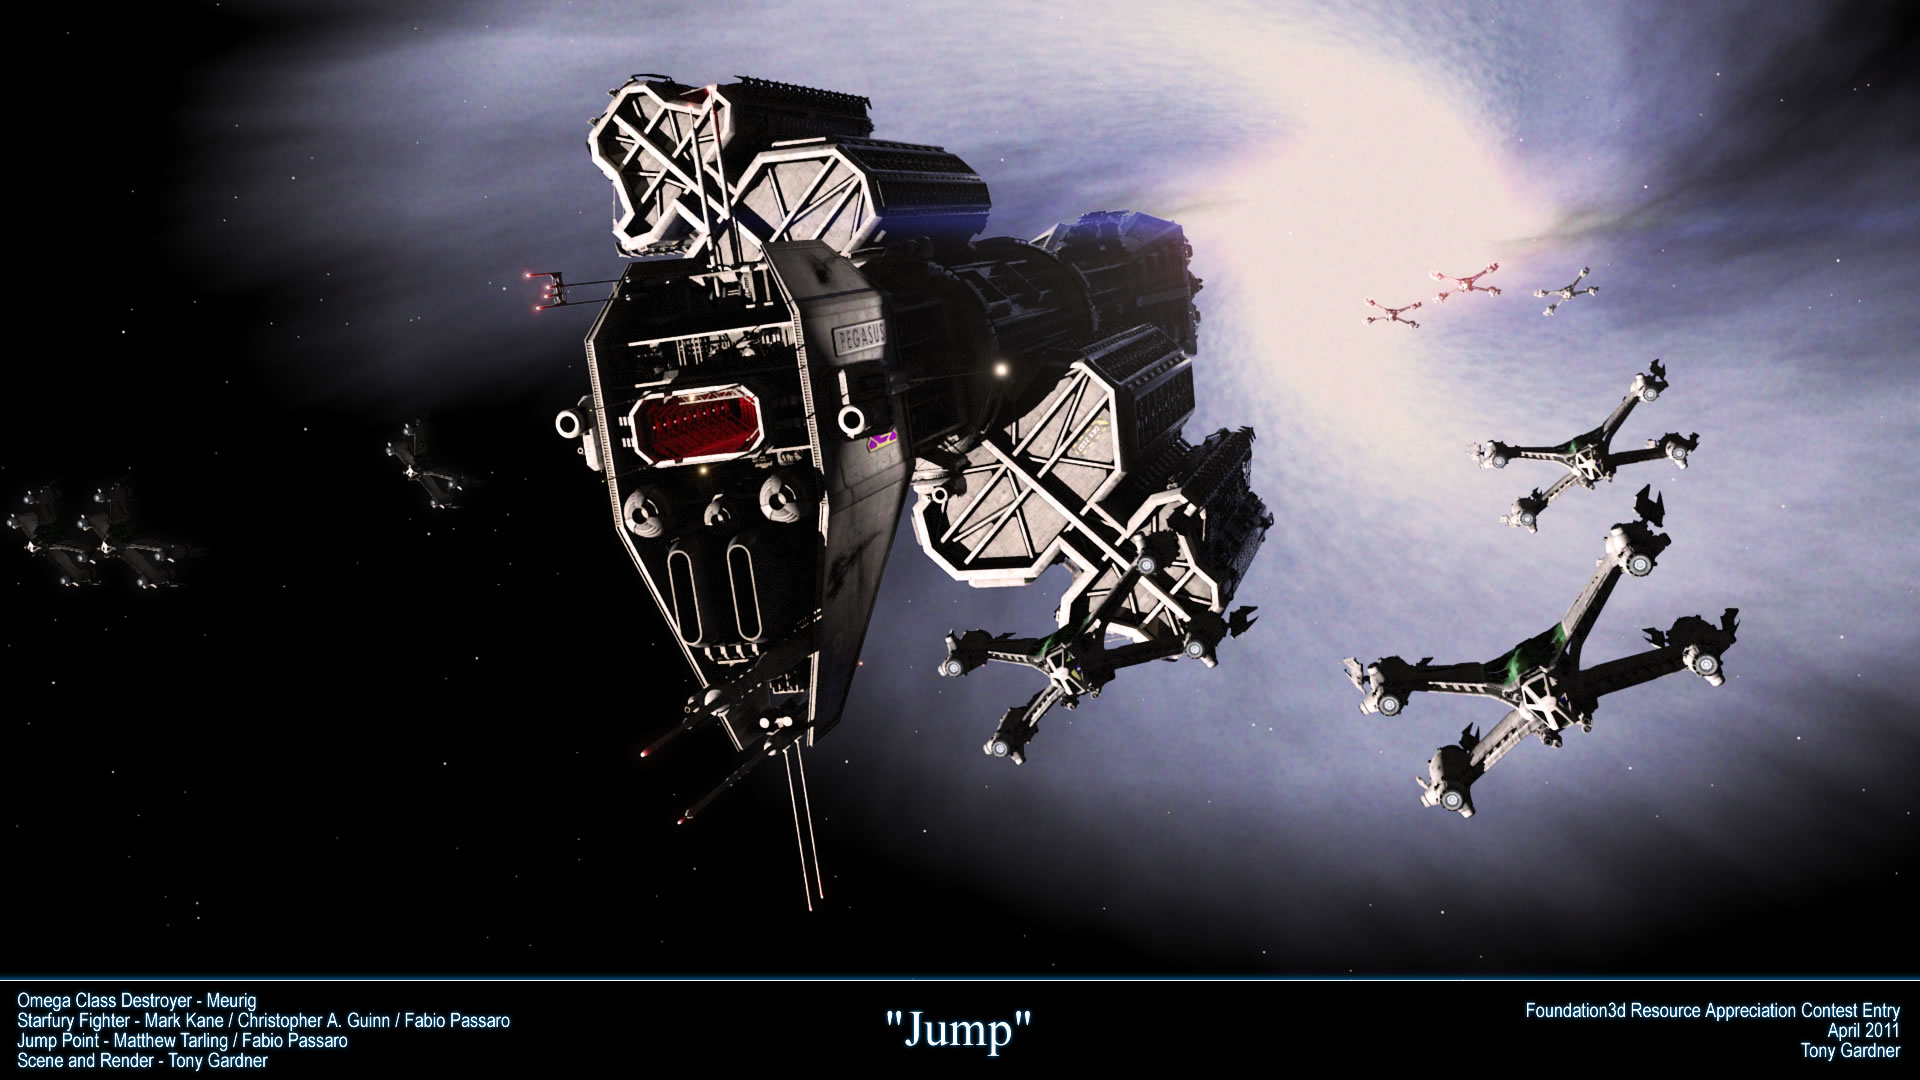 Jump by tonygardner